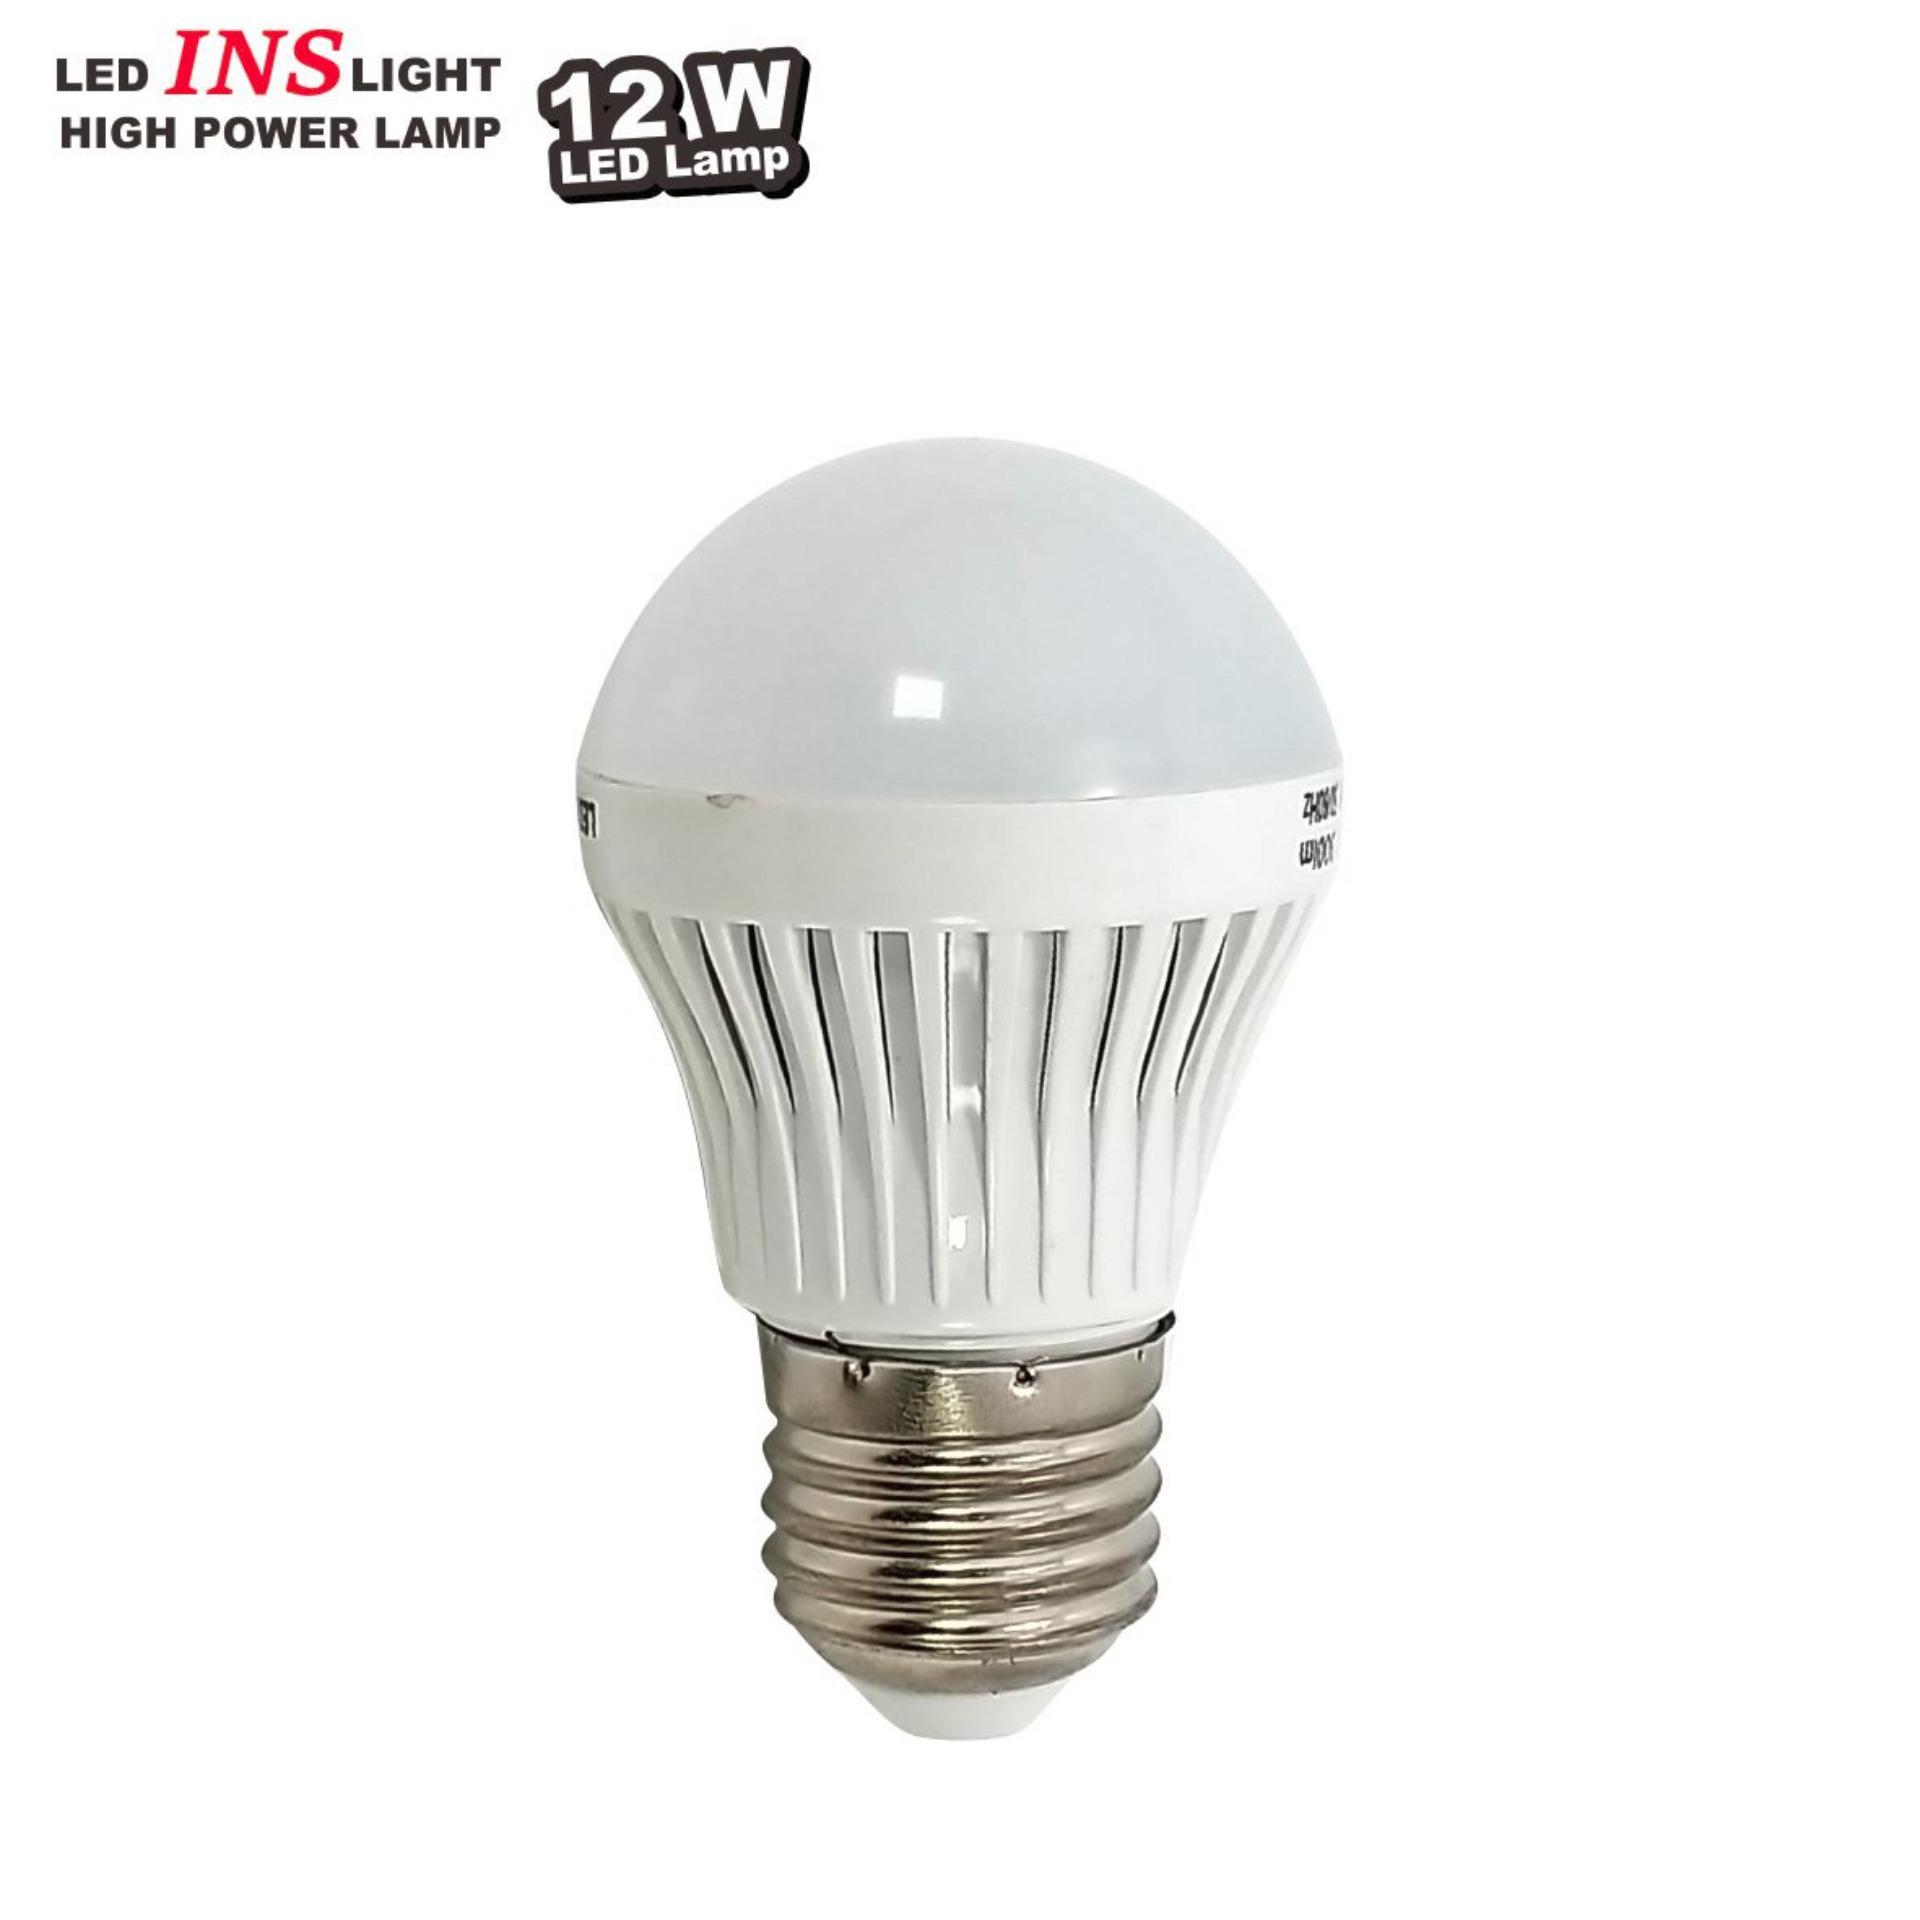 WEITECH LAMPU BOHLAM LED 12 WATT